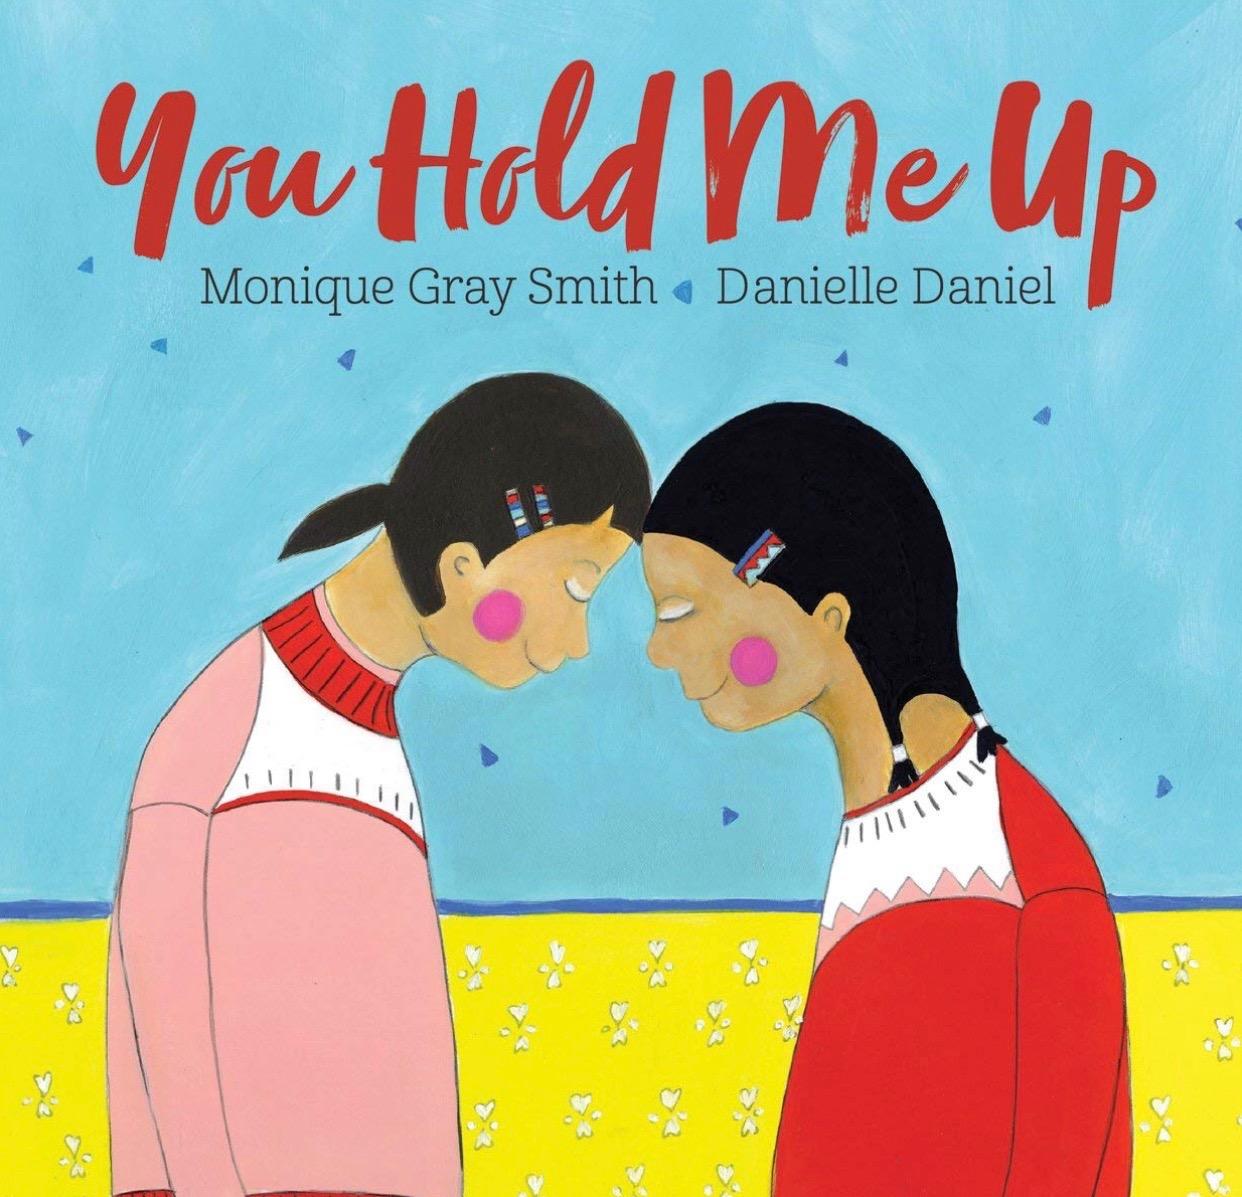 Written by Monique Gray Smith • Illustrated by Danielle Daniel